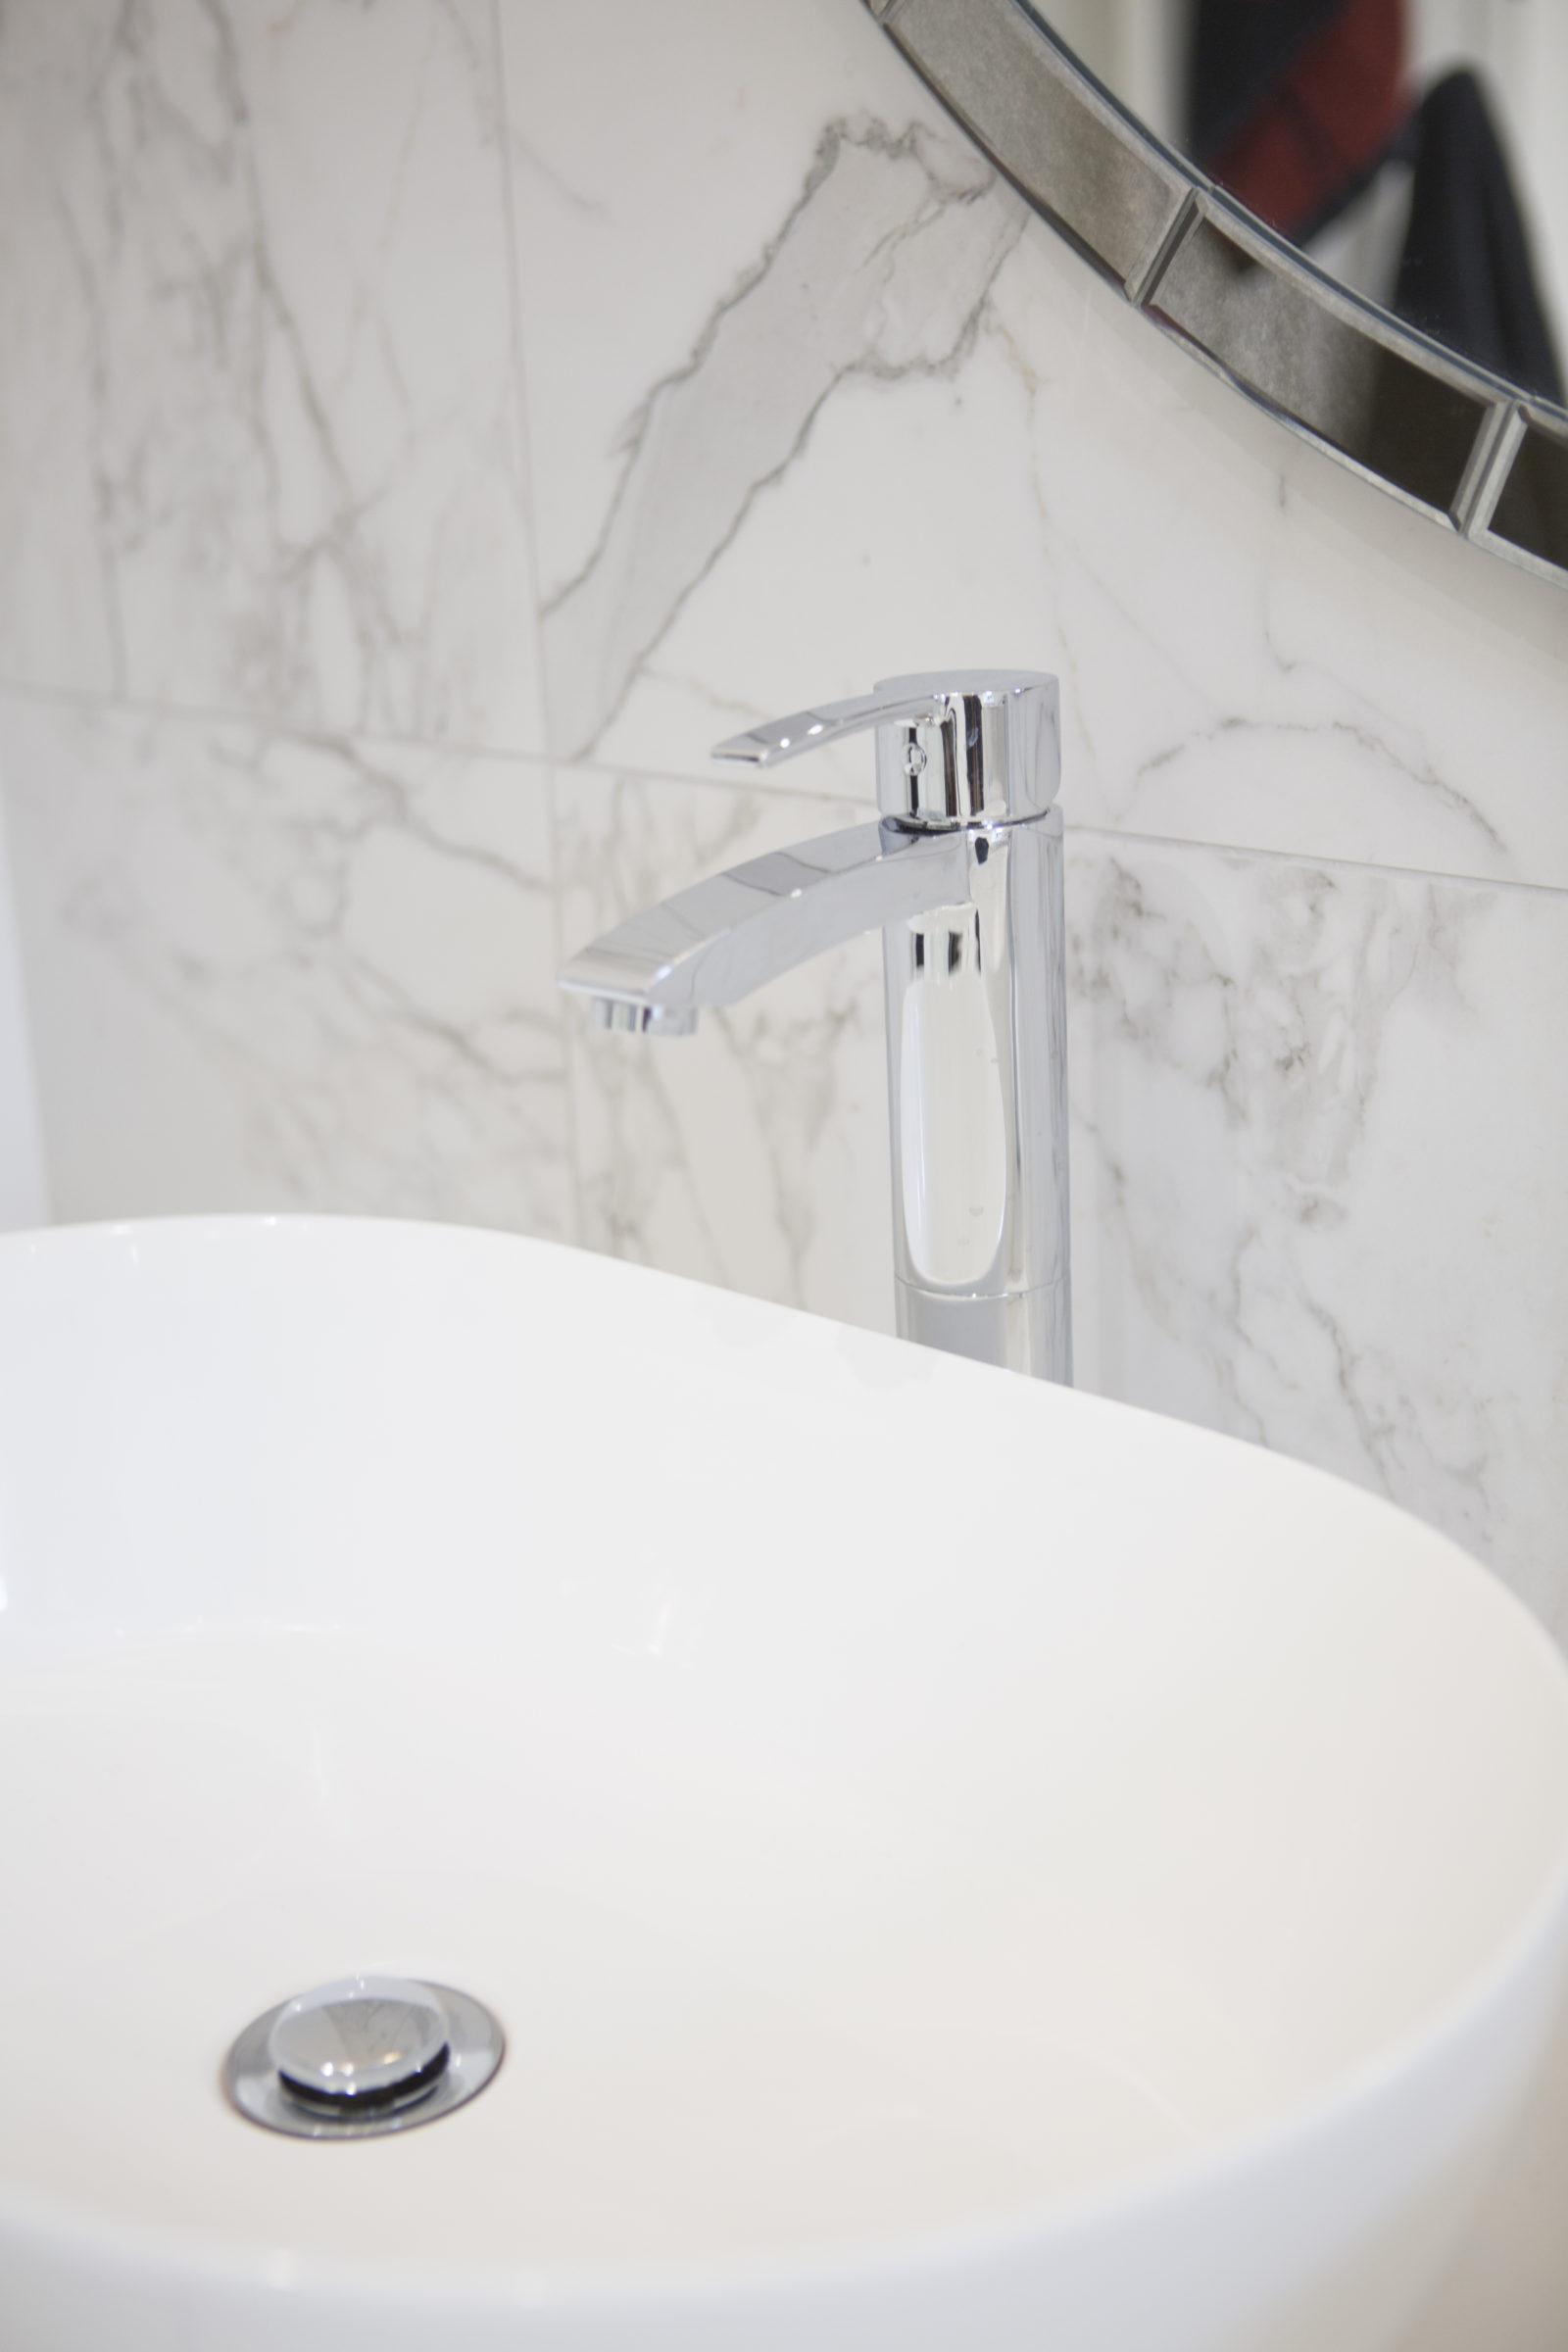 Bespoke fitted modern bathroom designs Berkshire, interior designer Oxfordshire, small bathroom interior design, master bathroom refurbishment, home decor, interior stylist, interior designer London, bespoke bathrooms Oxfordshire, bespoke fitted bathrooms Buckingham, bathro